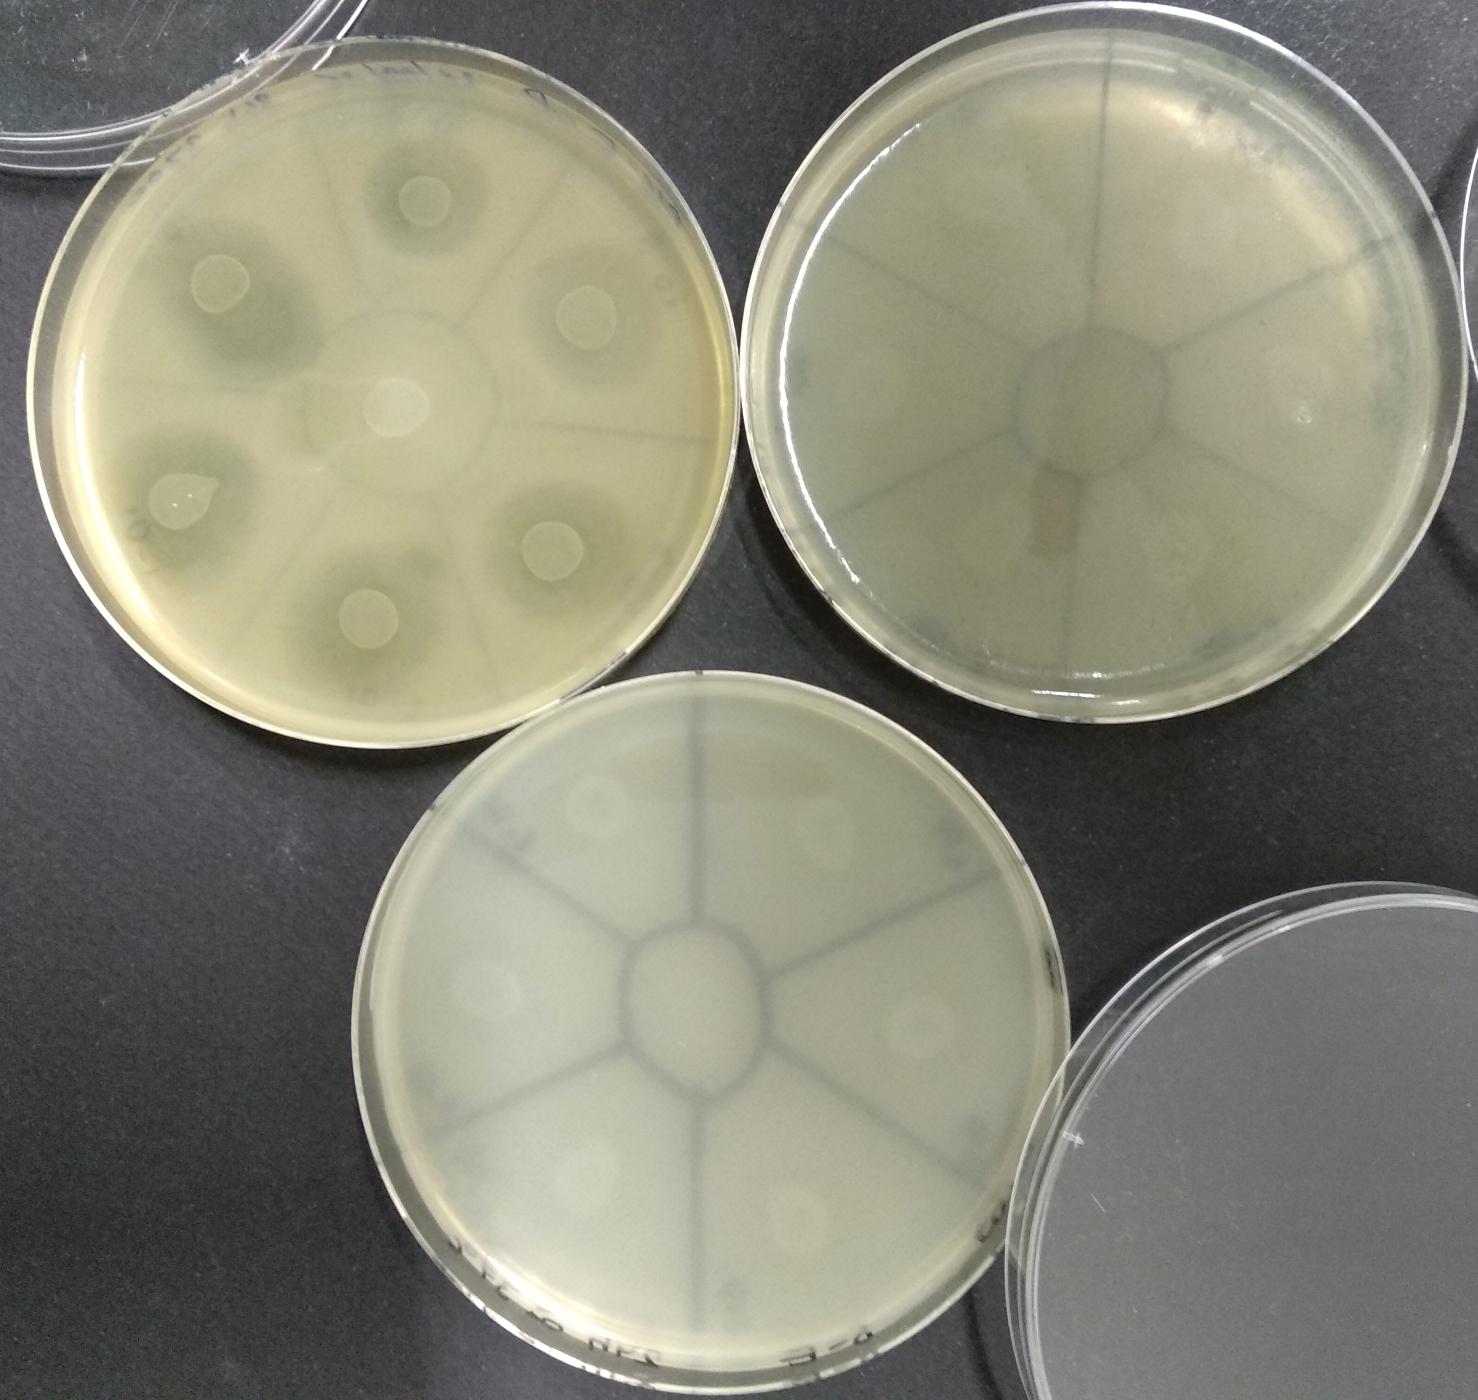 Phages 2018 1b